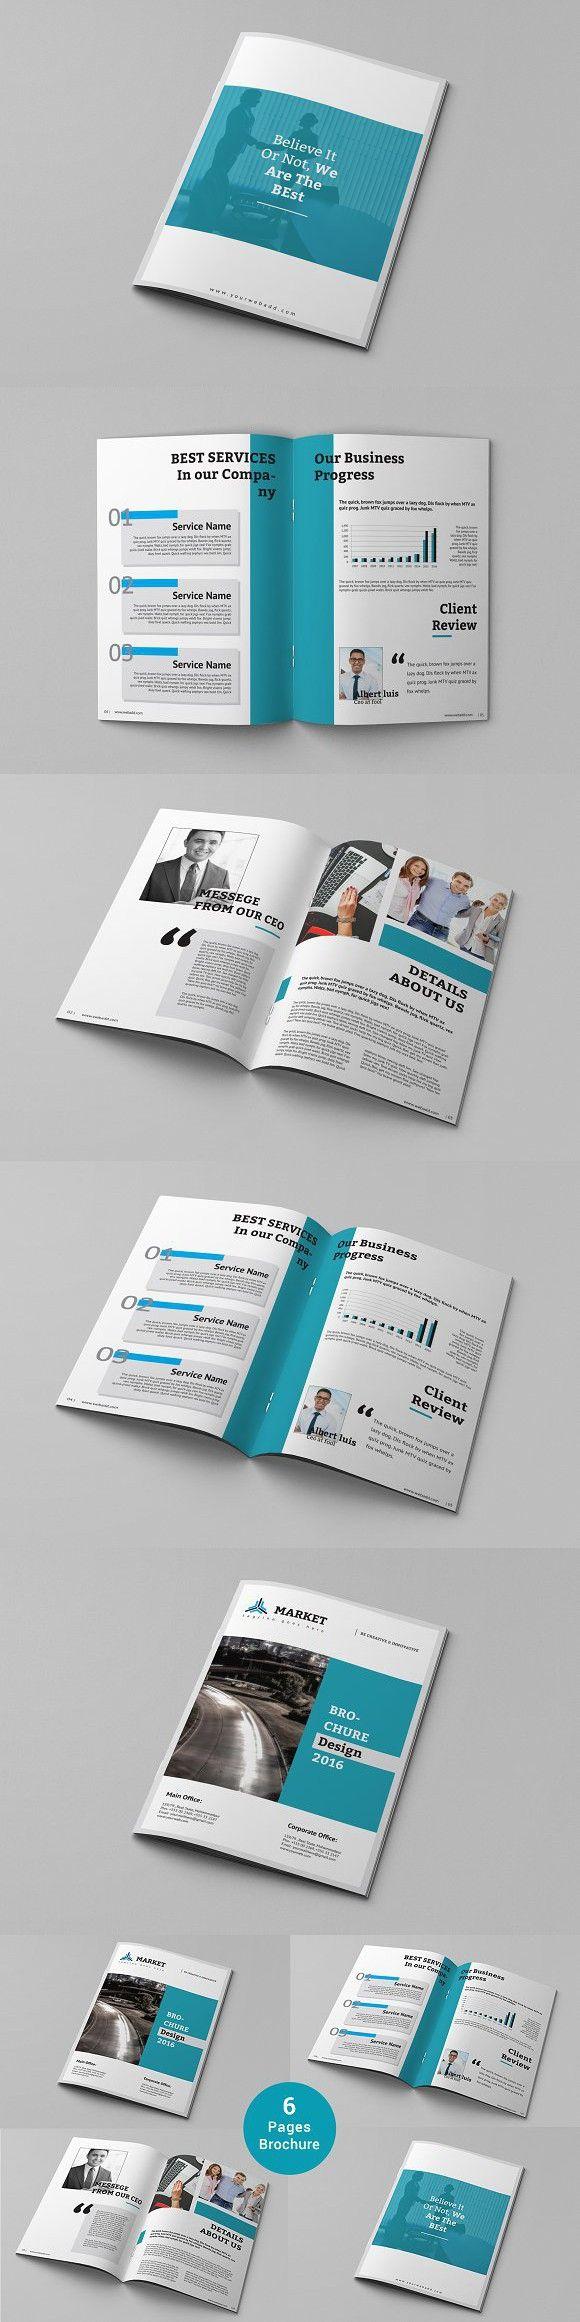 Best Keynote Templates Images On Pinterest - Keynote brochure template